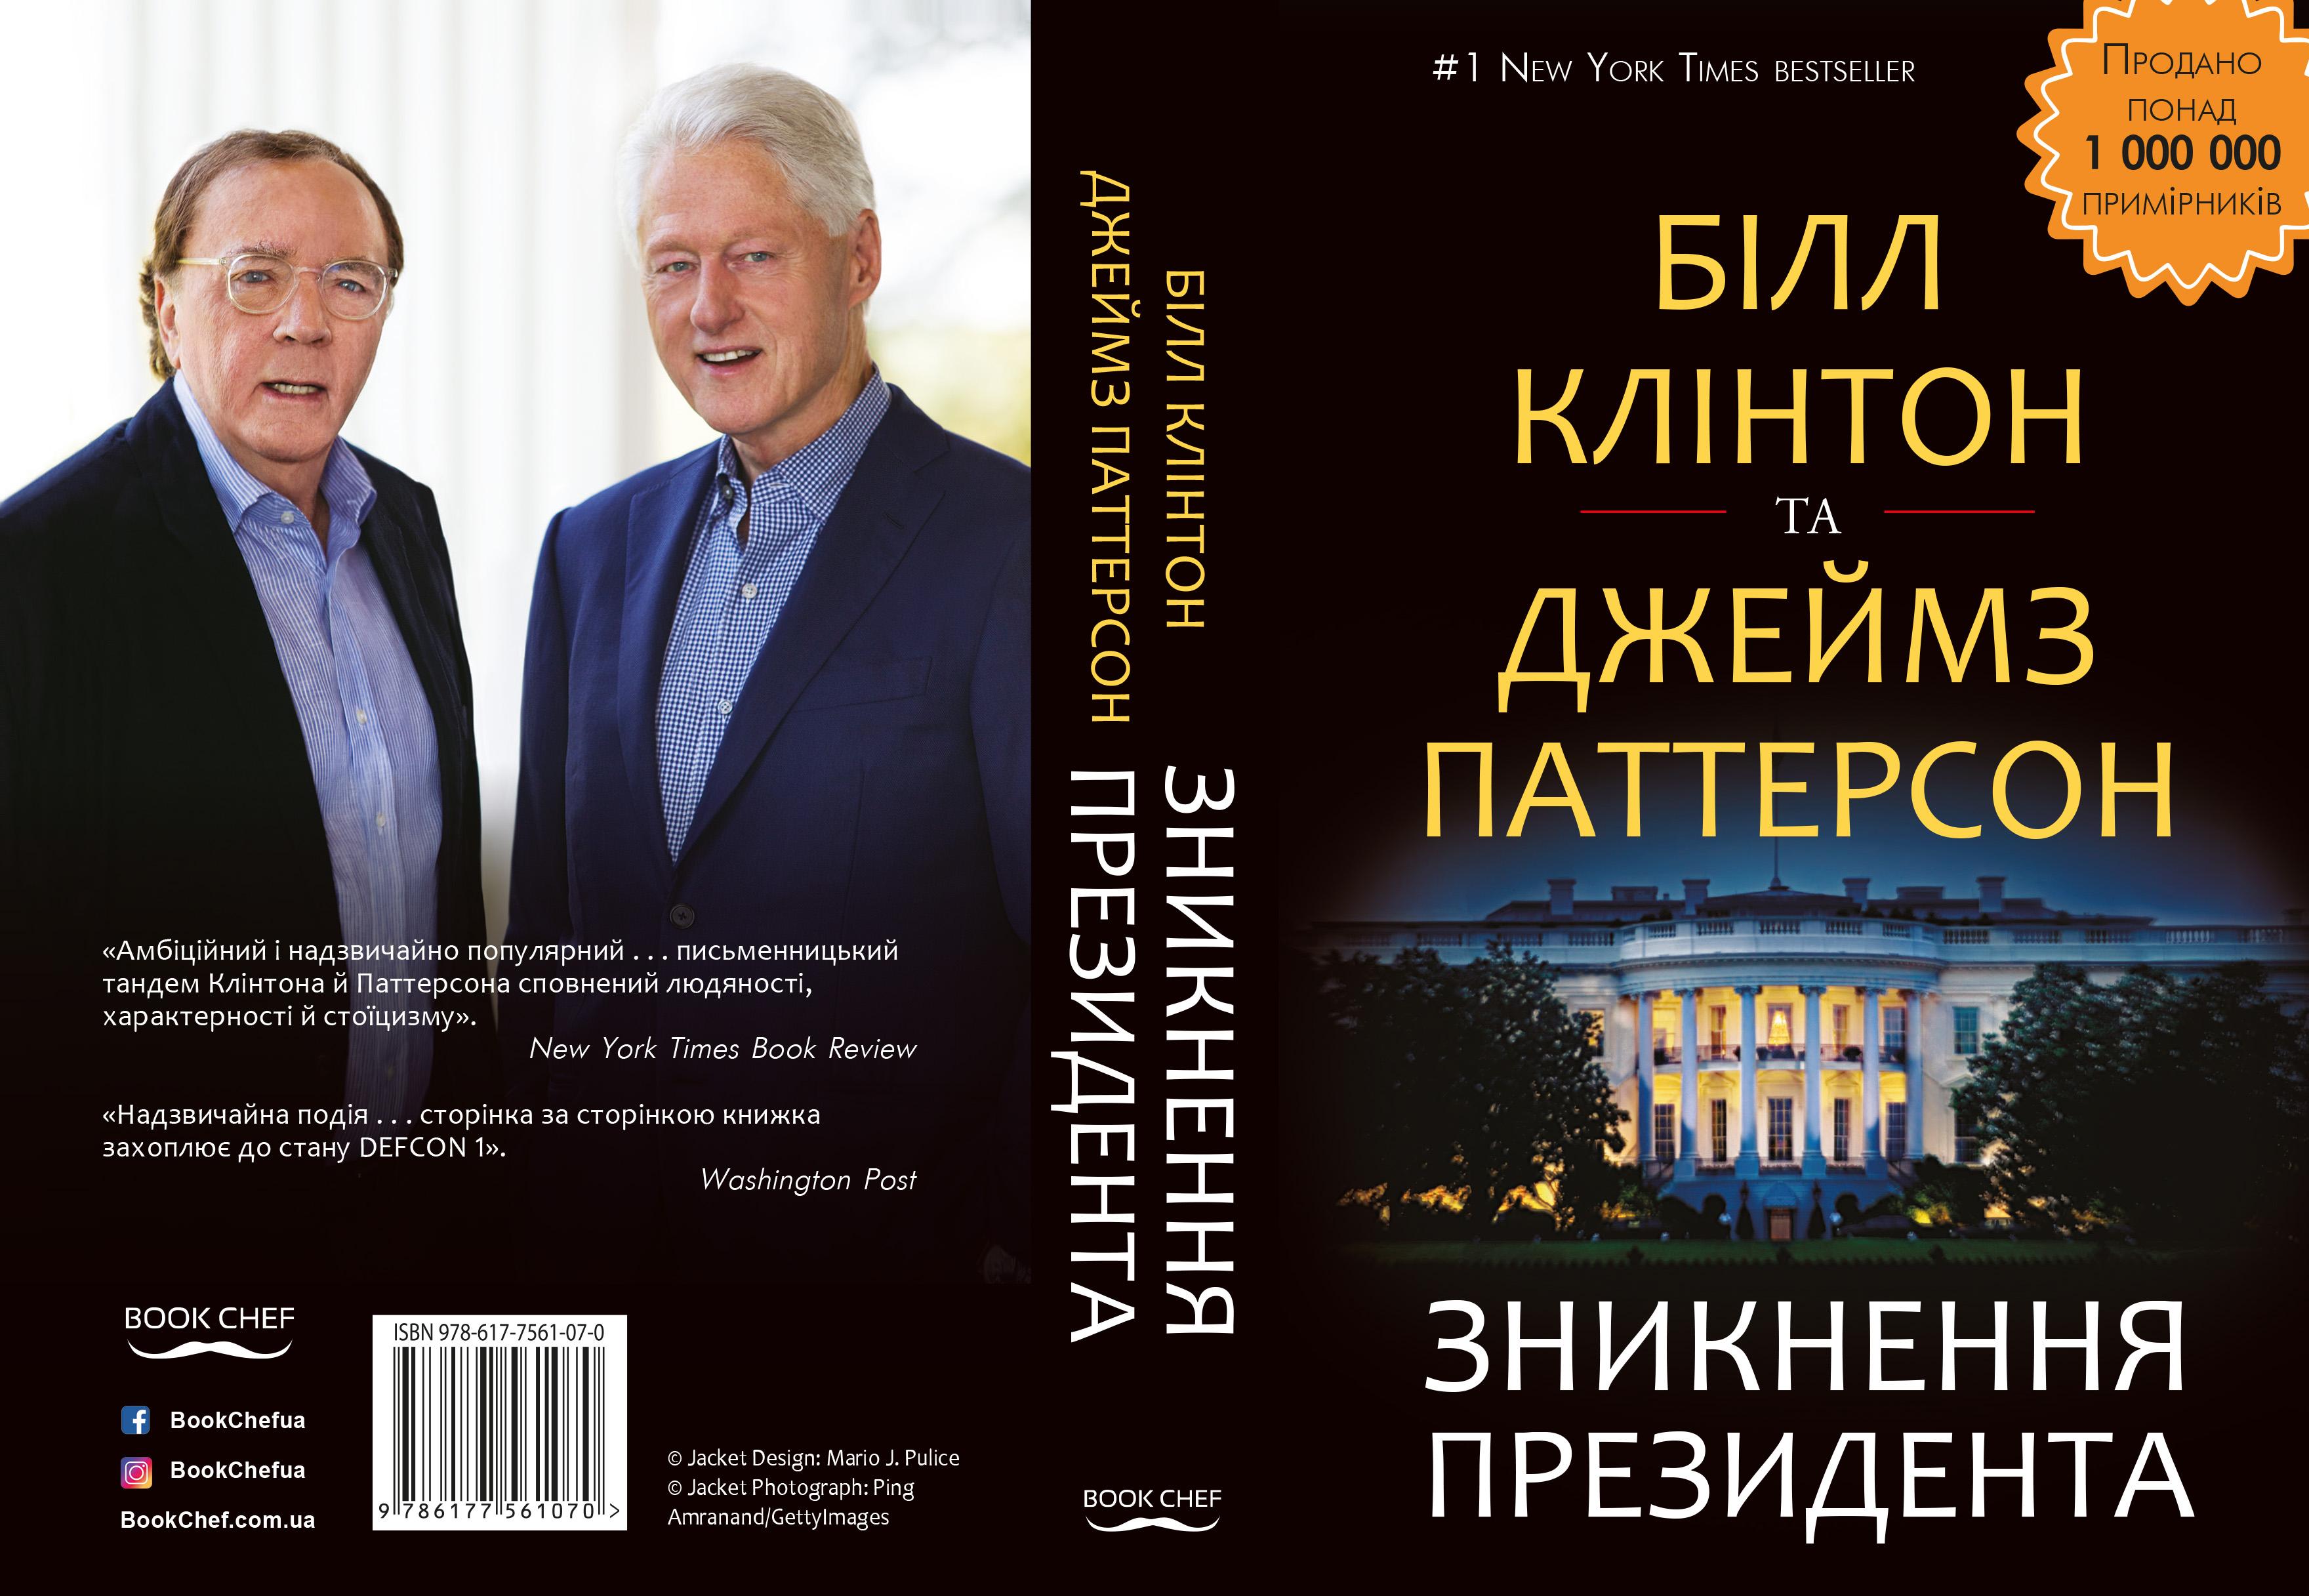 Билл Клинтон, книги